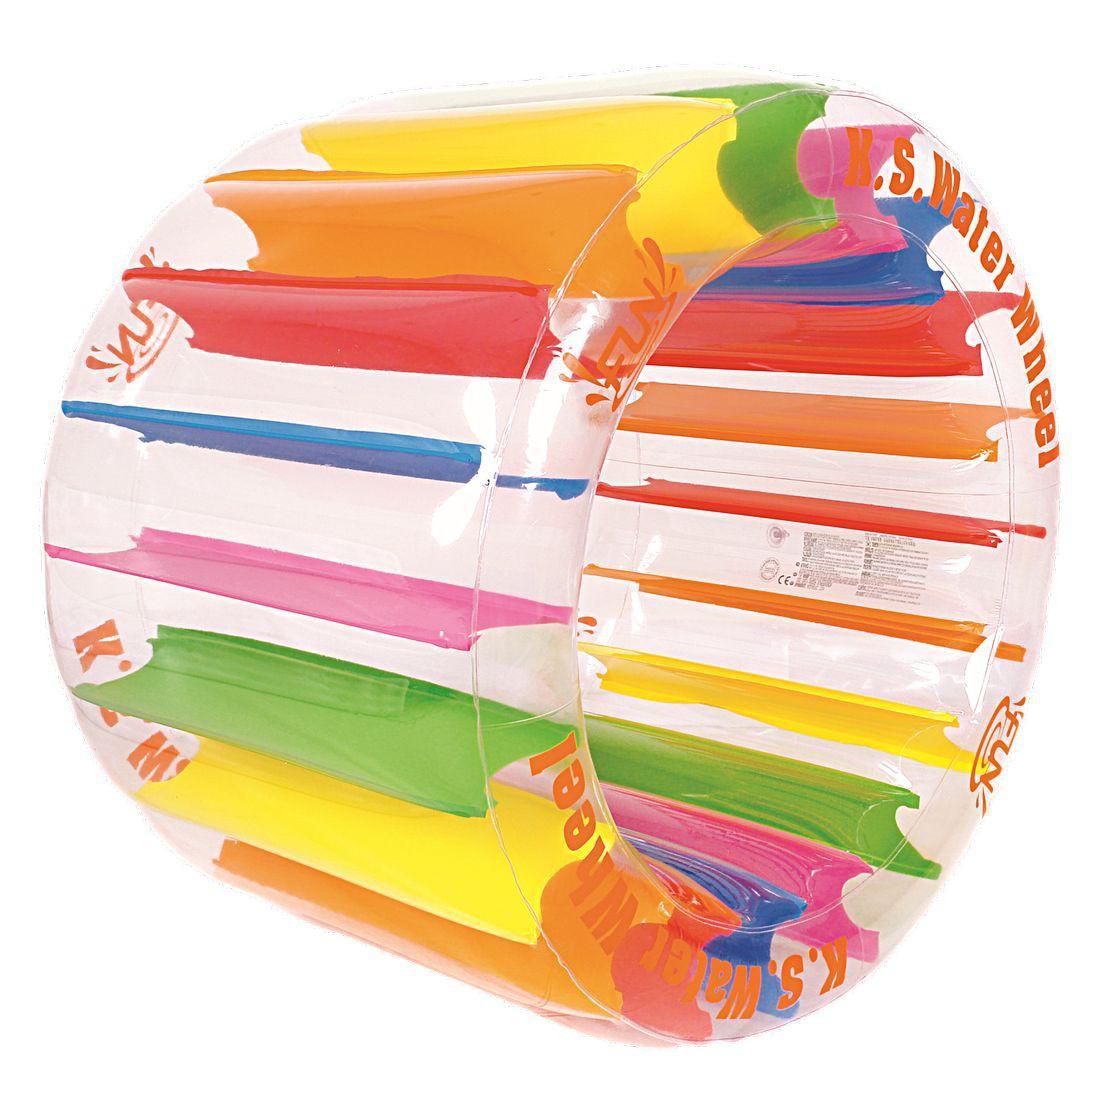 jilong kid ster wheel 125 cm wasser laufrad hamsterrad wasserspielzeug wasser walze wasserspa. Black Bedroom Furniture Sets. Home Design Ideas